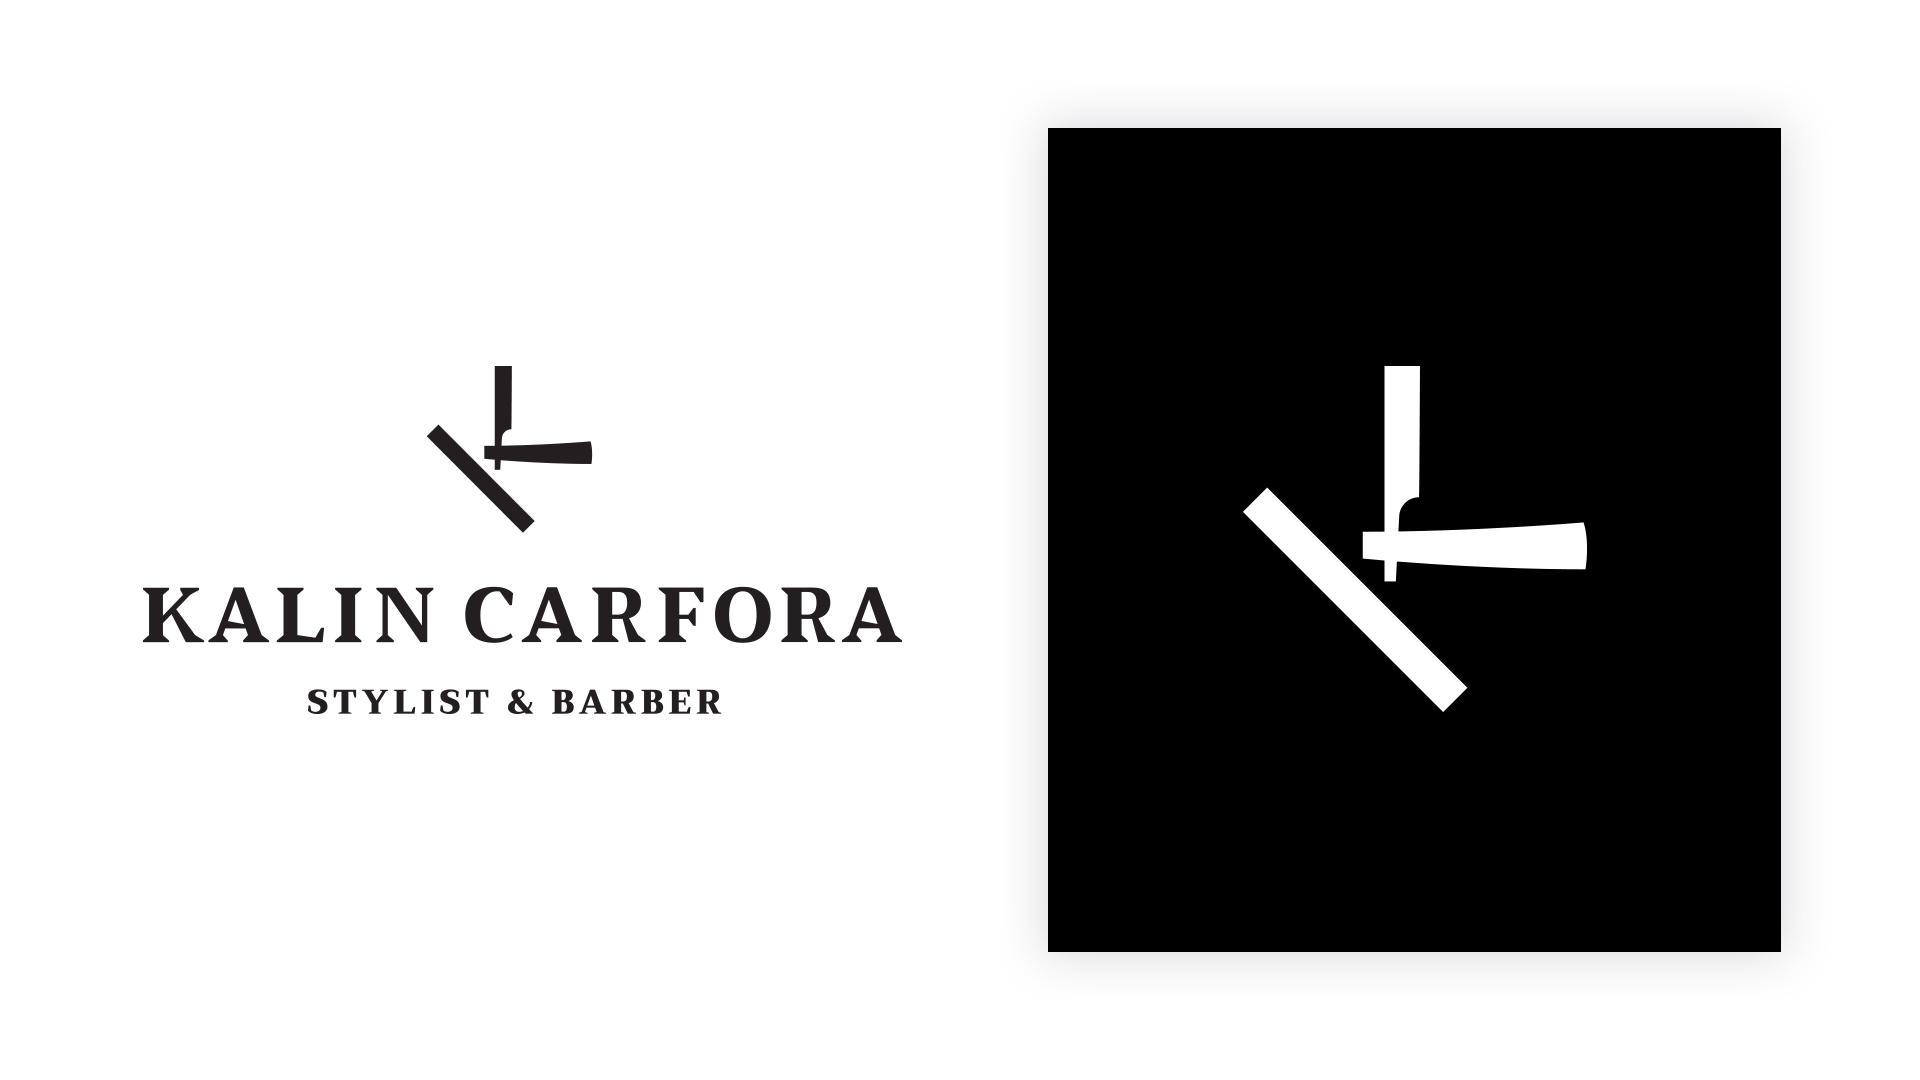 ZanBarnett-Logo-KalinCarfora.jpg